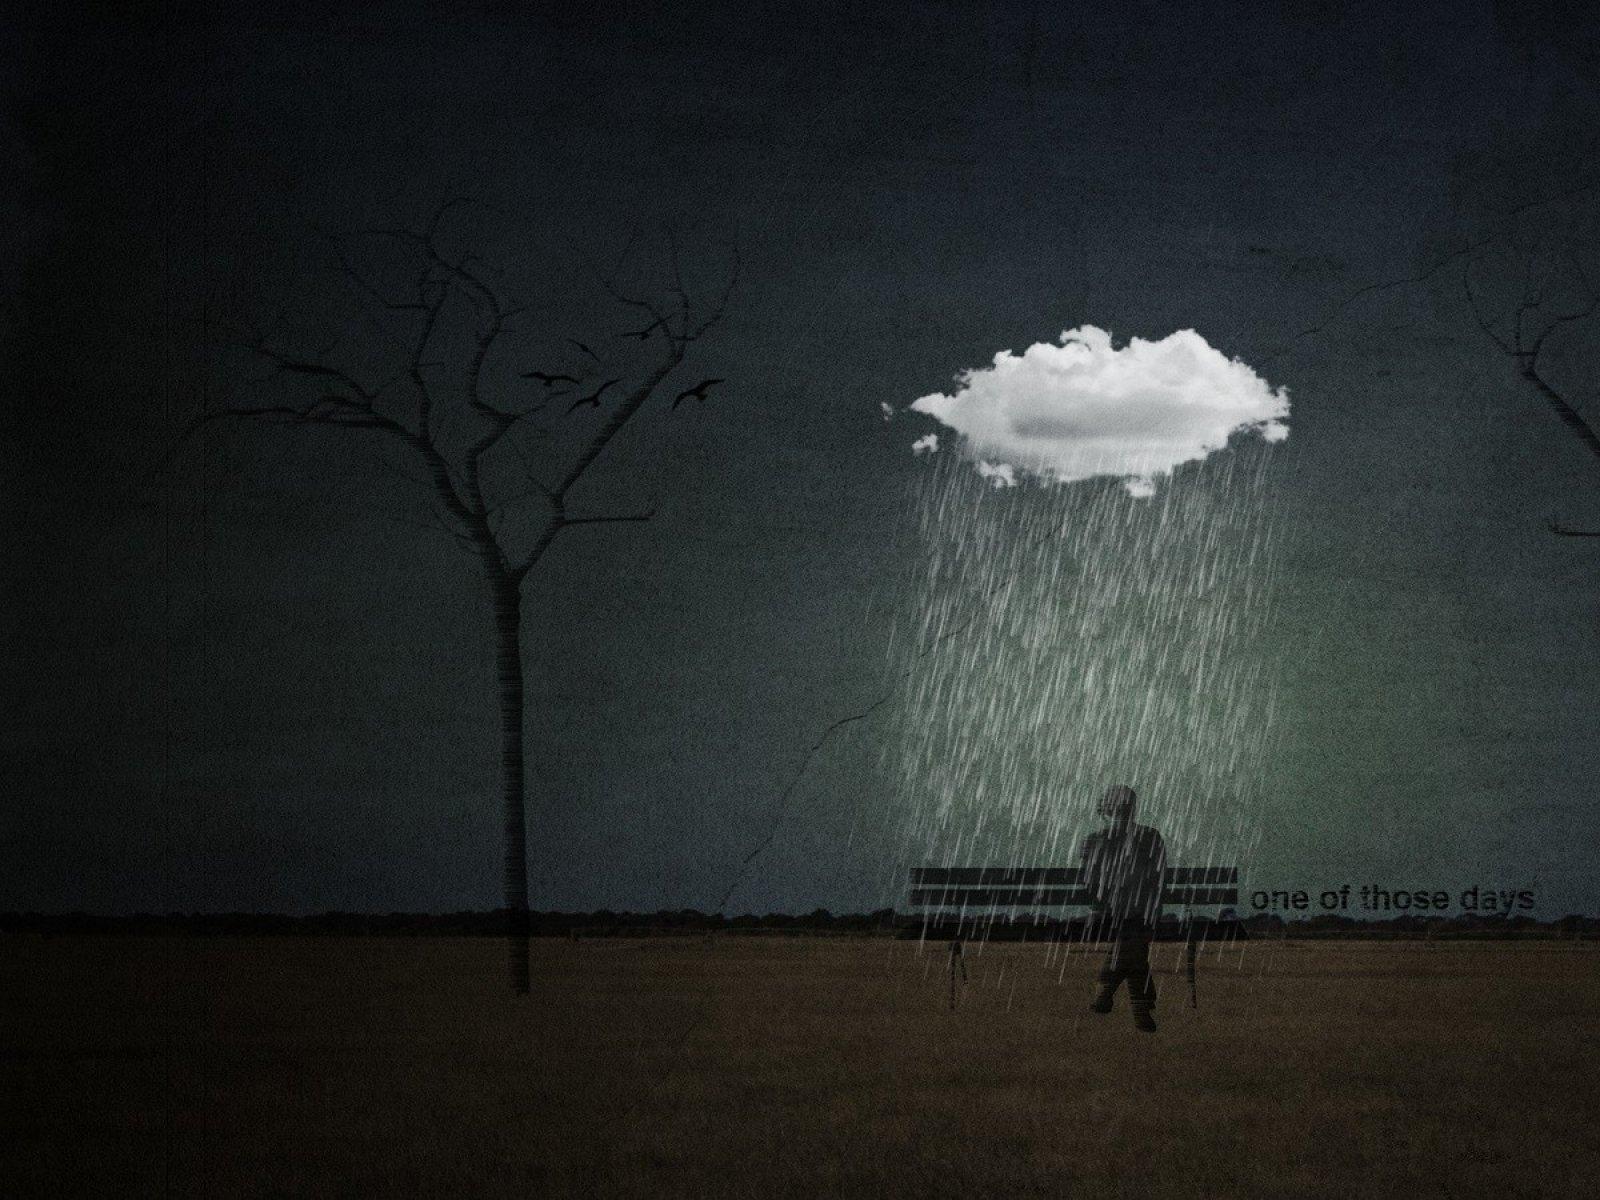 dark sadness wallpaper background - photo #29